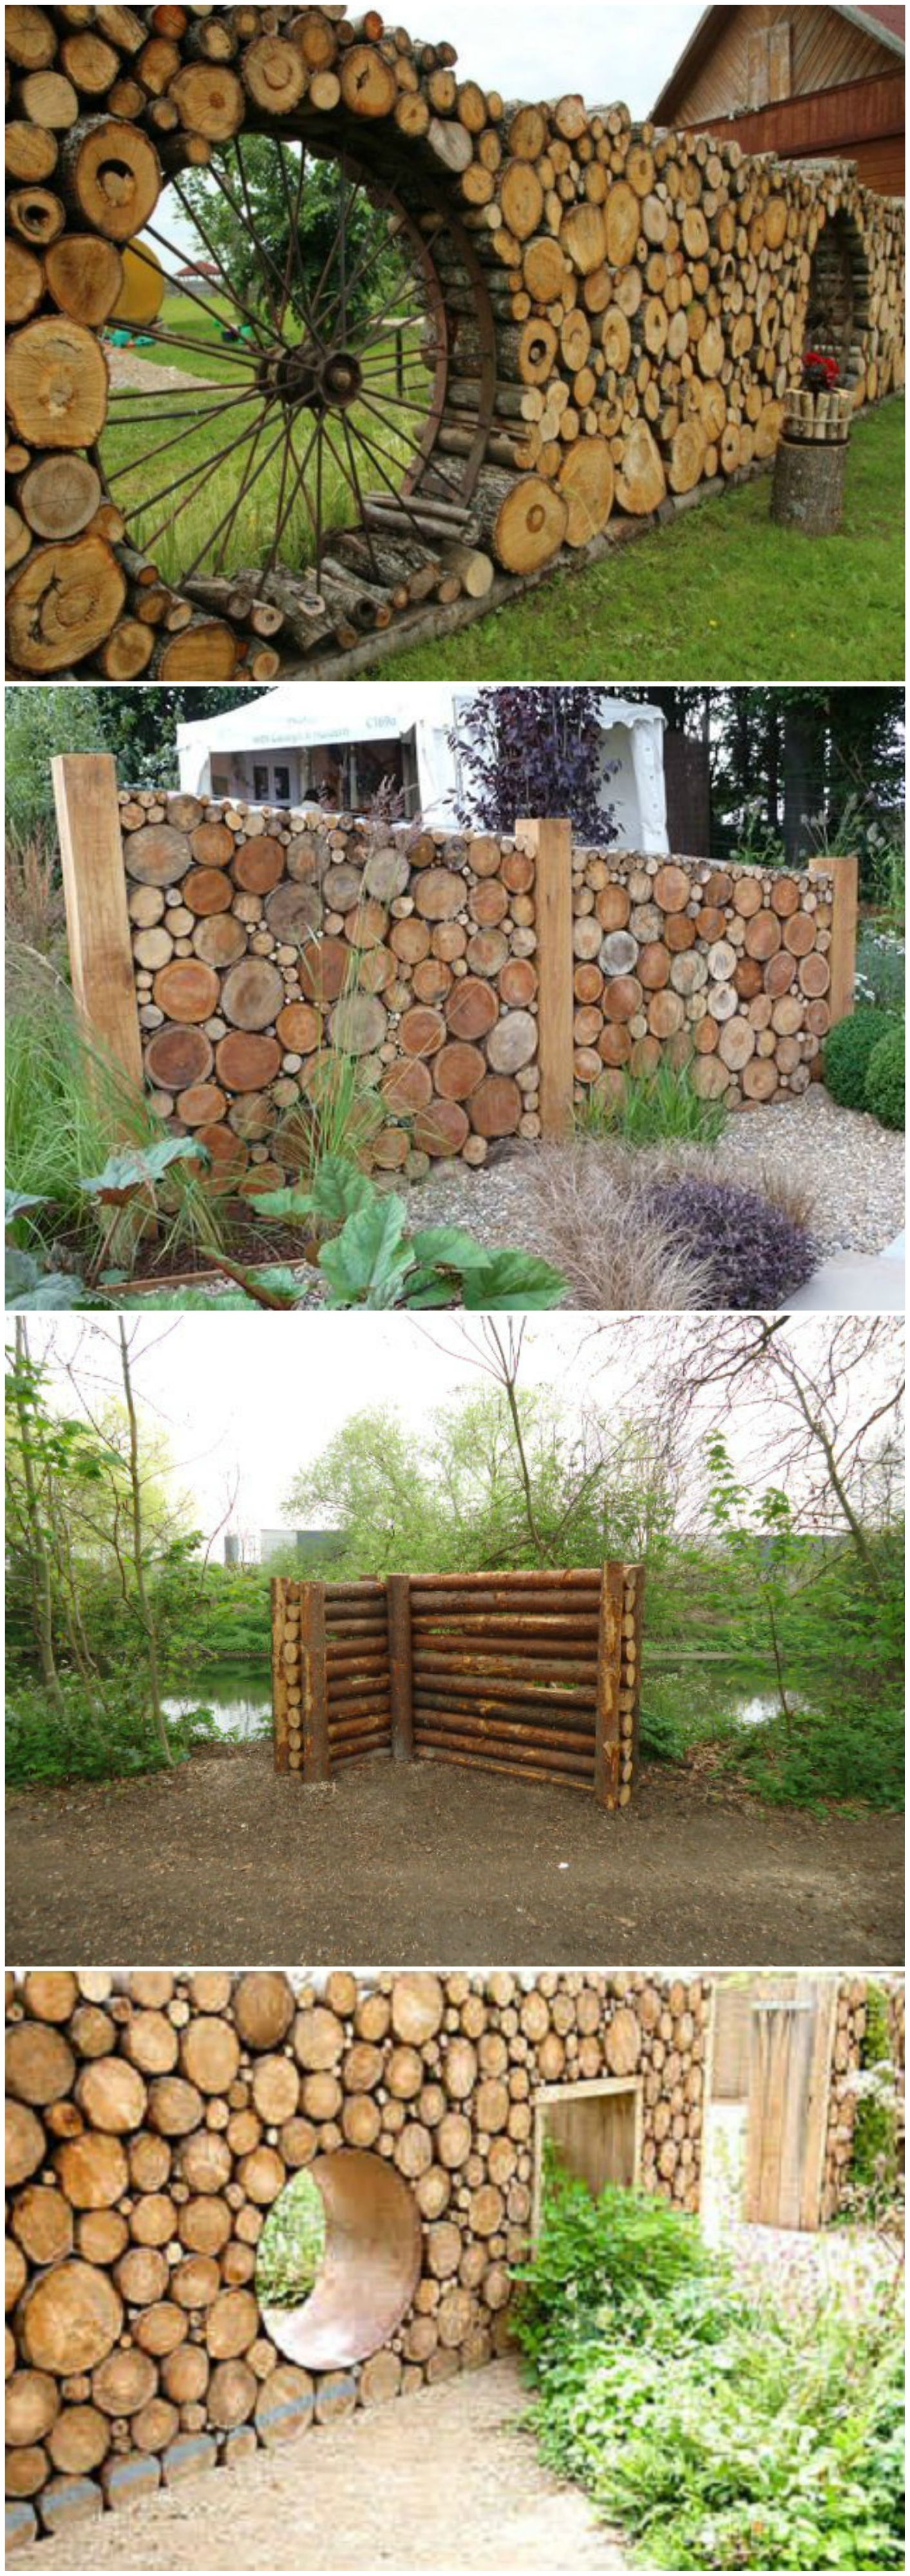 Resultado de imagen de cordwood table | Jardin y Peces | Pinterest ... - Rondin De Bois Deco Jardin